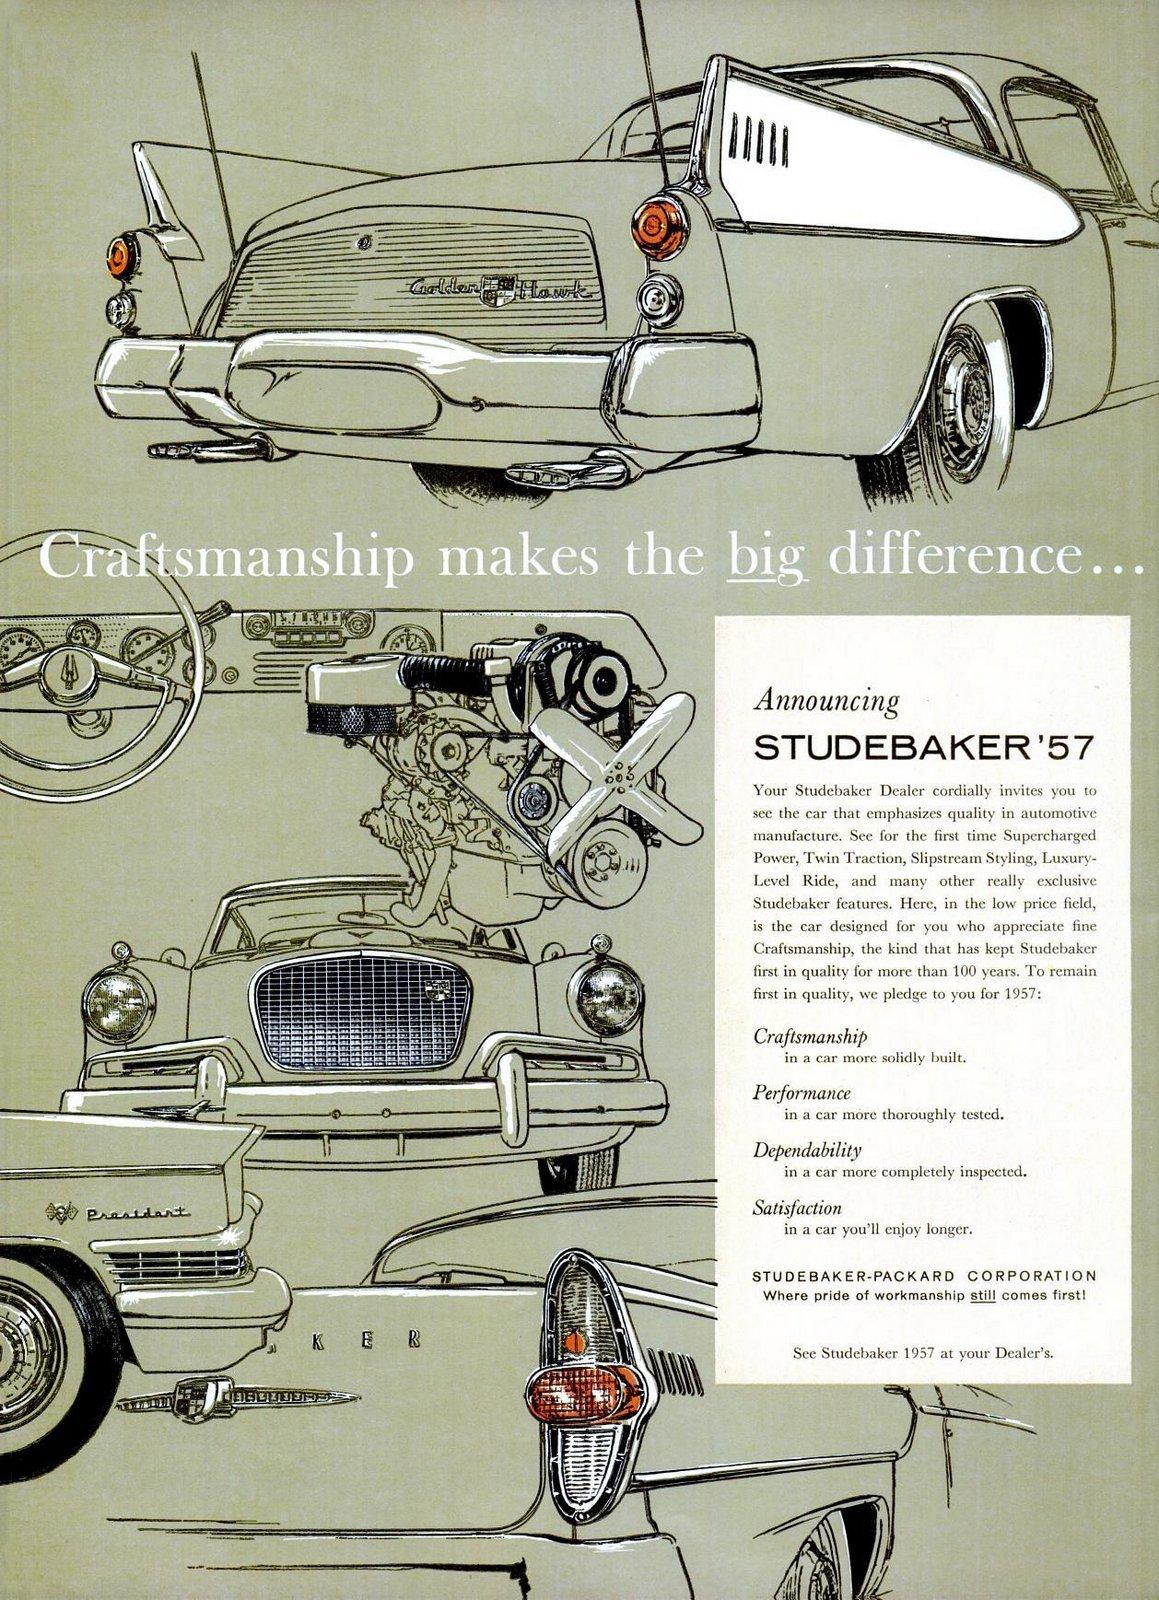 Studebaker '57 craftsmanship - 1956 cars